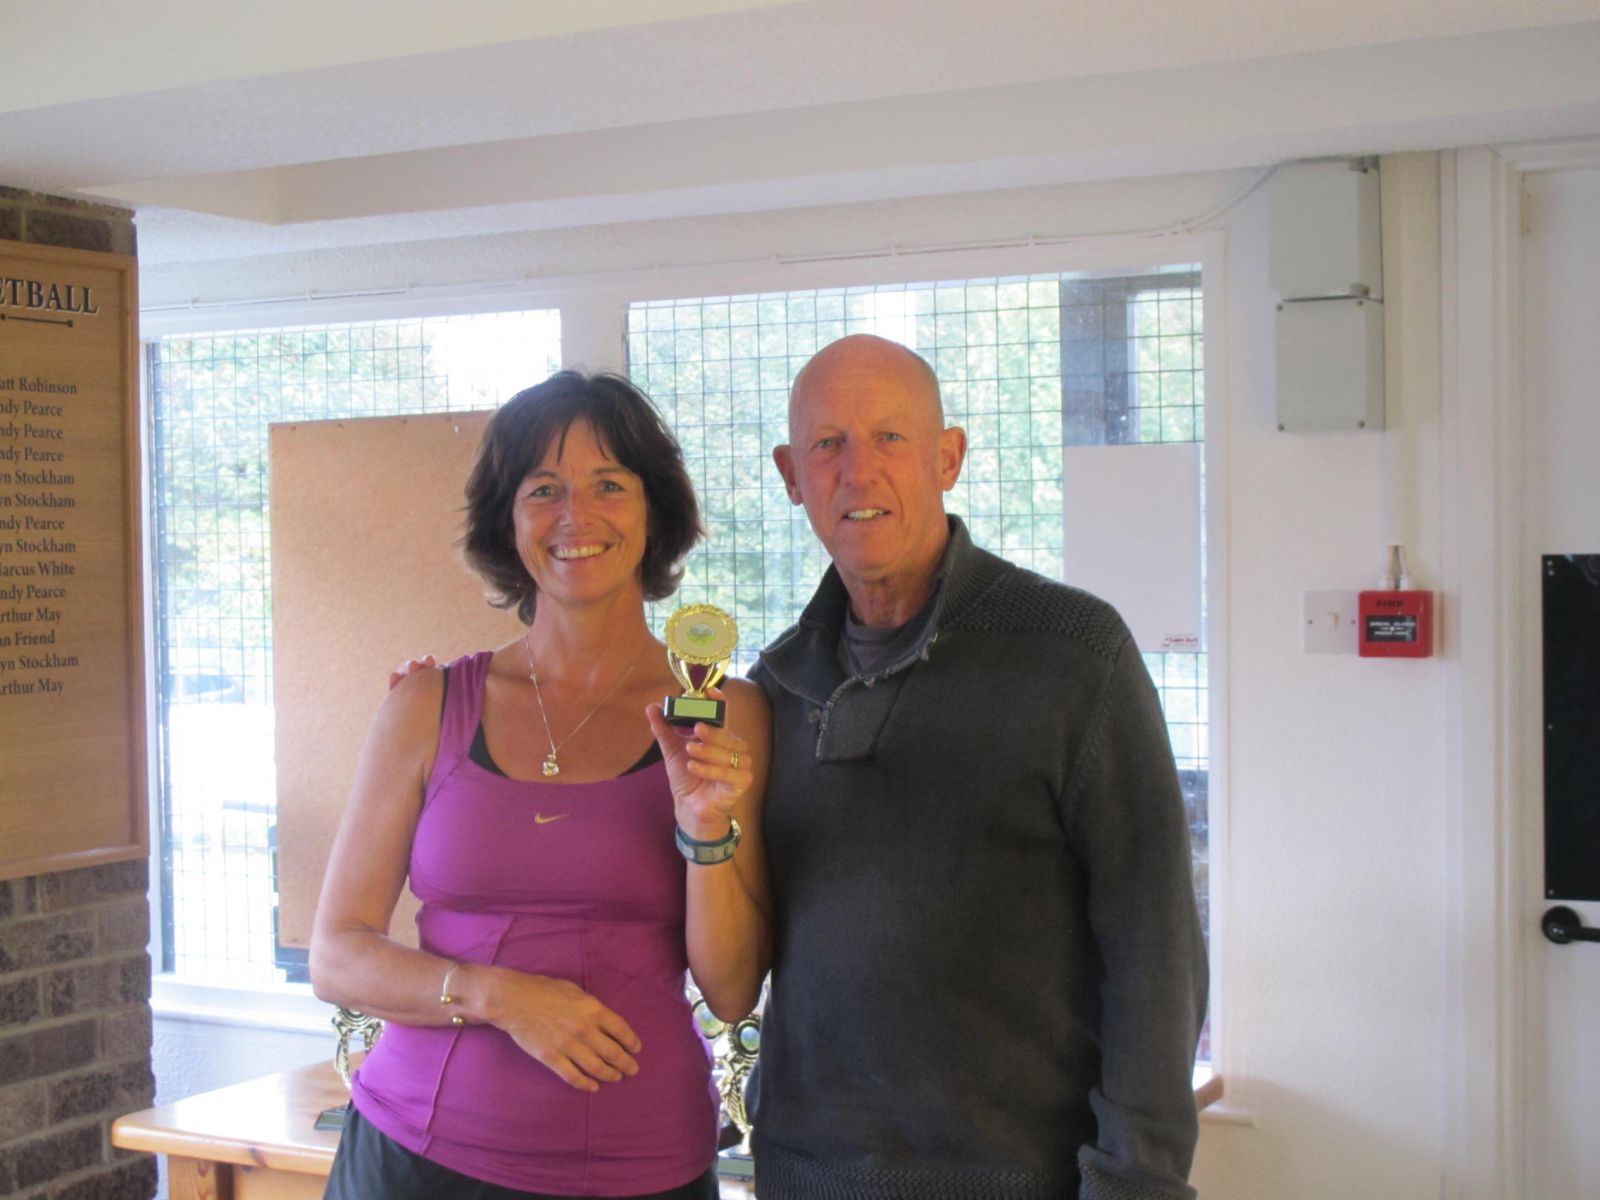 Ladies' Singles runner-up Elspeth Gracie with Tennis Chairman Mike Henderson